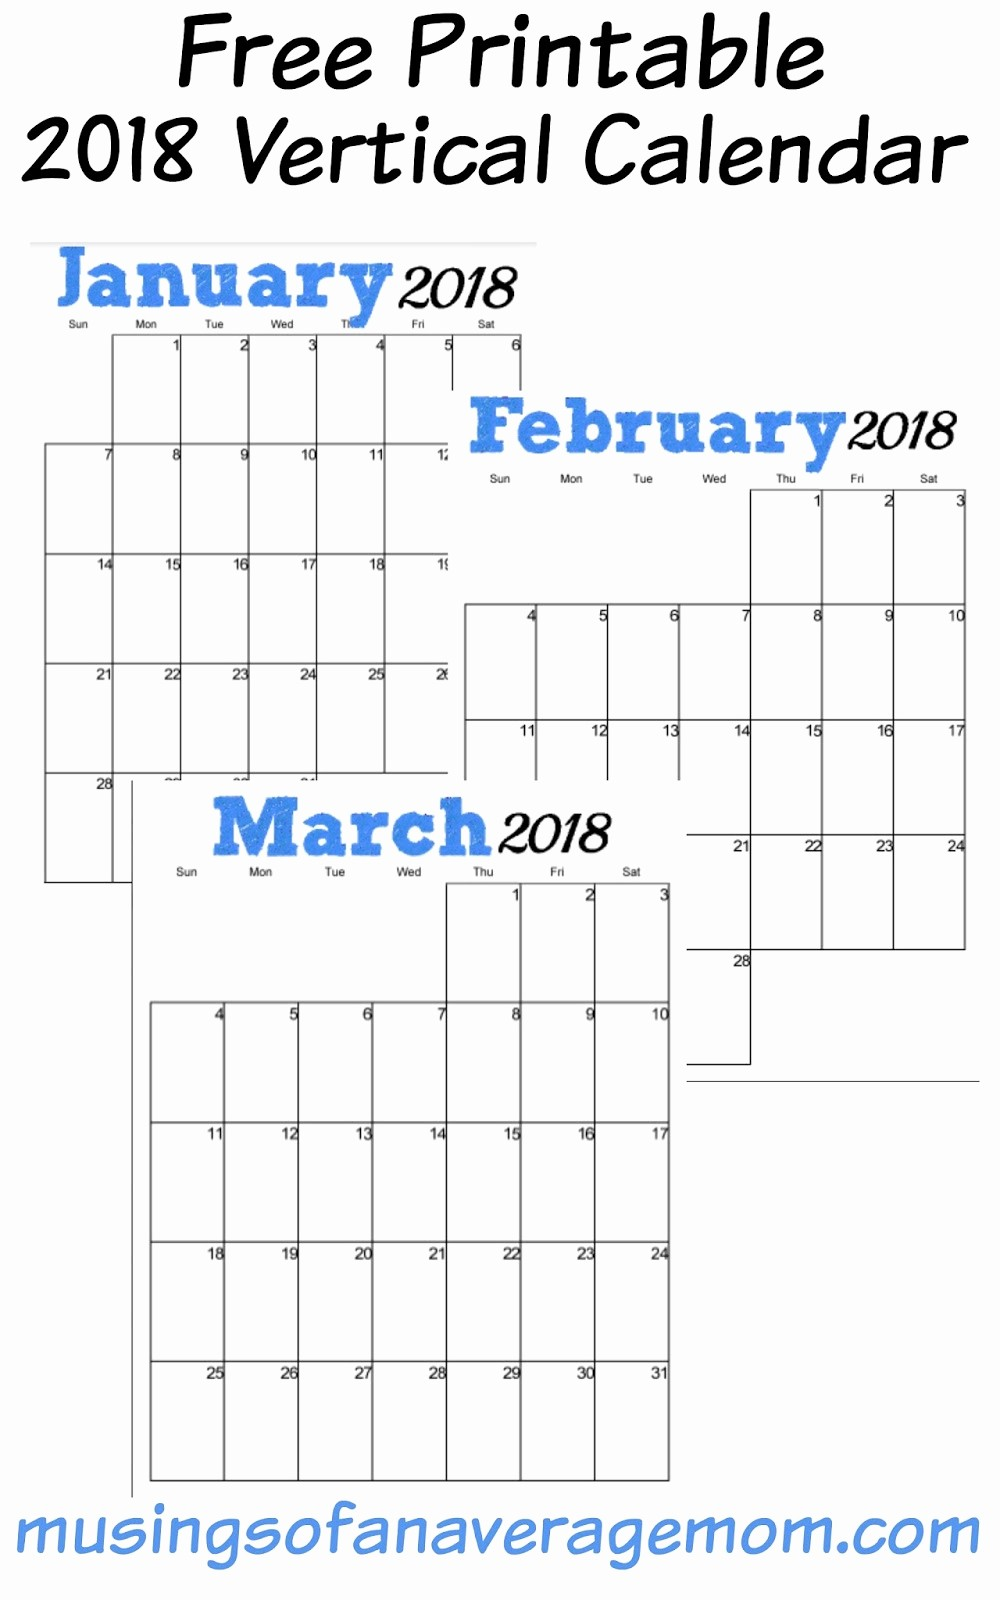 Free Printable Yearly Calendar 2018 Beautiful Musings Of An Average Mom 2018 Calendars From Musings Of